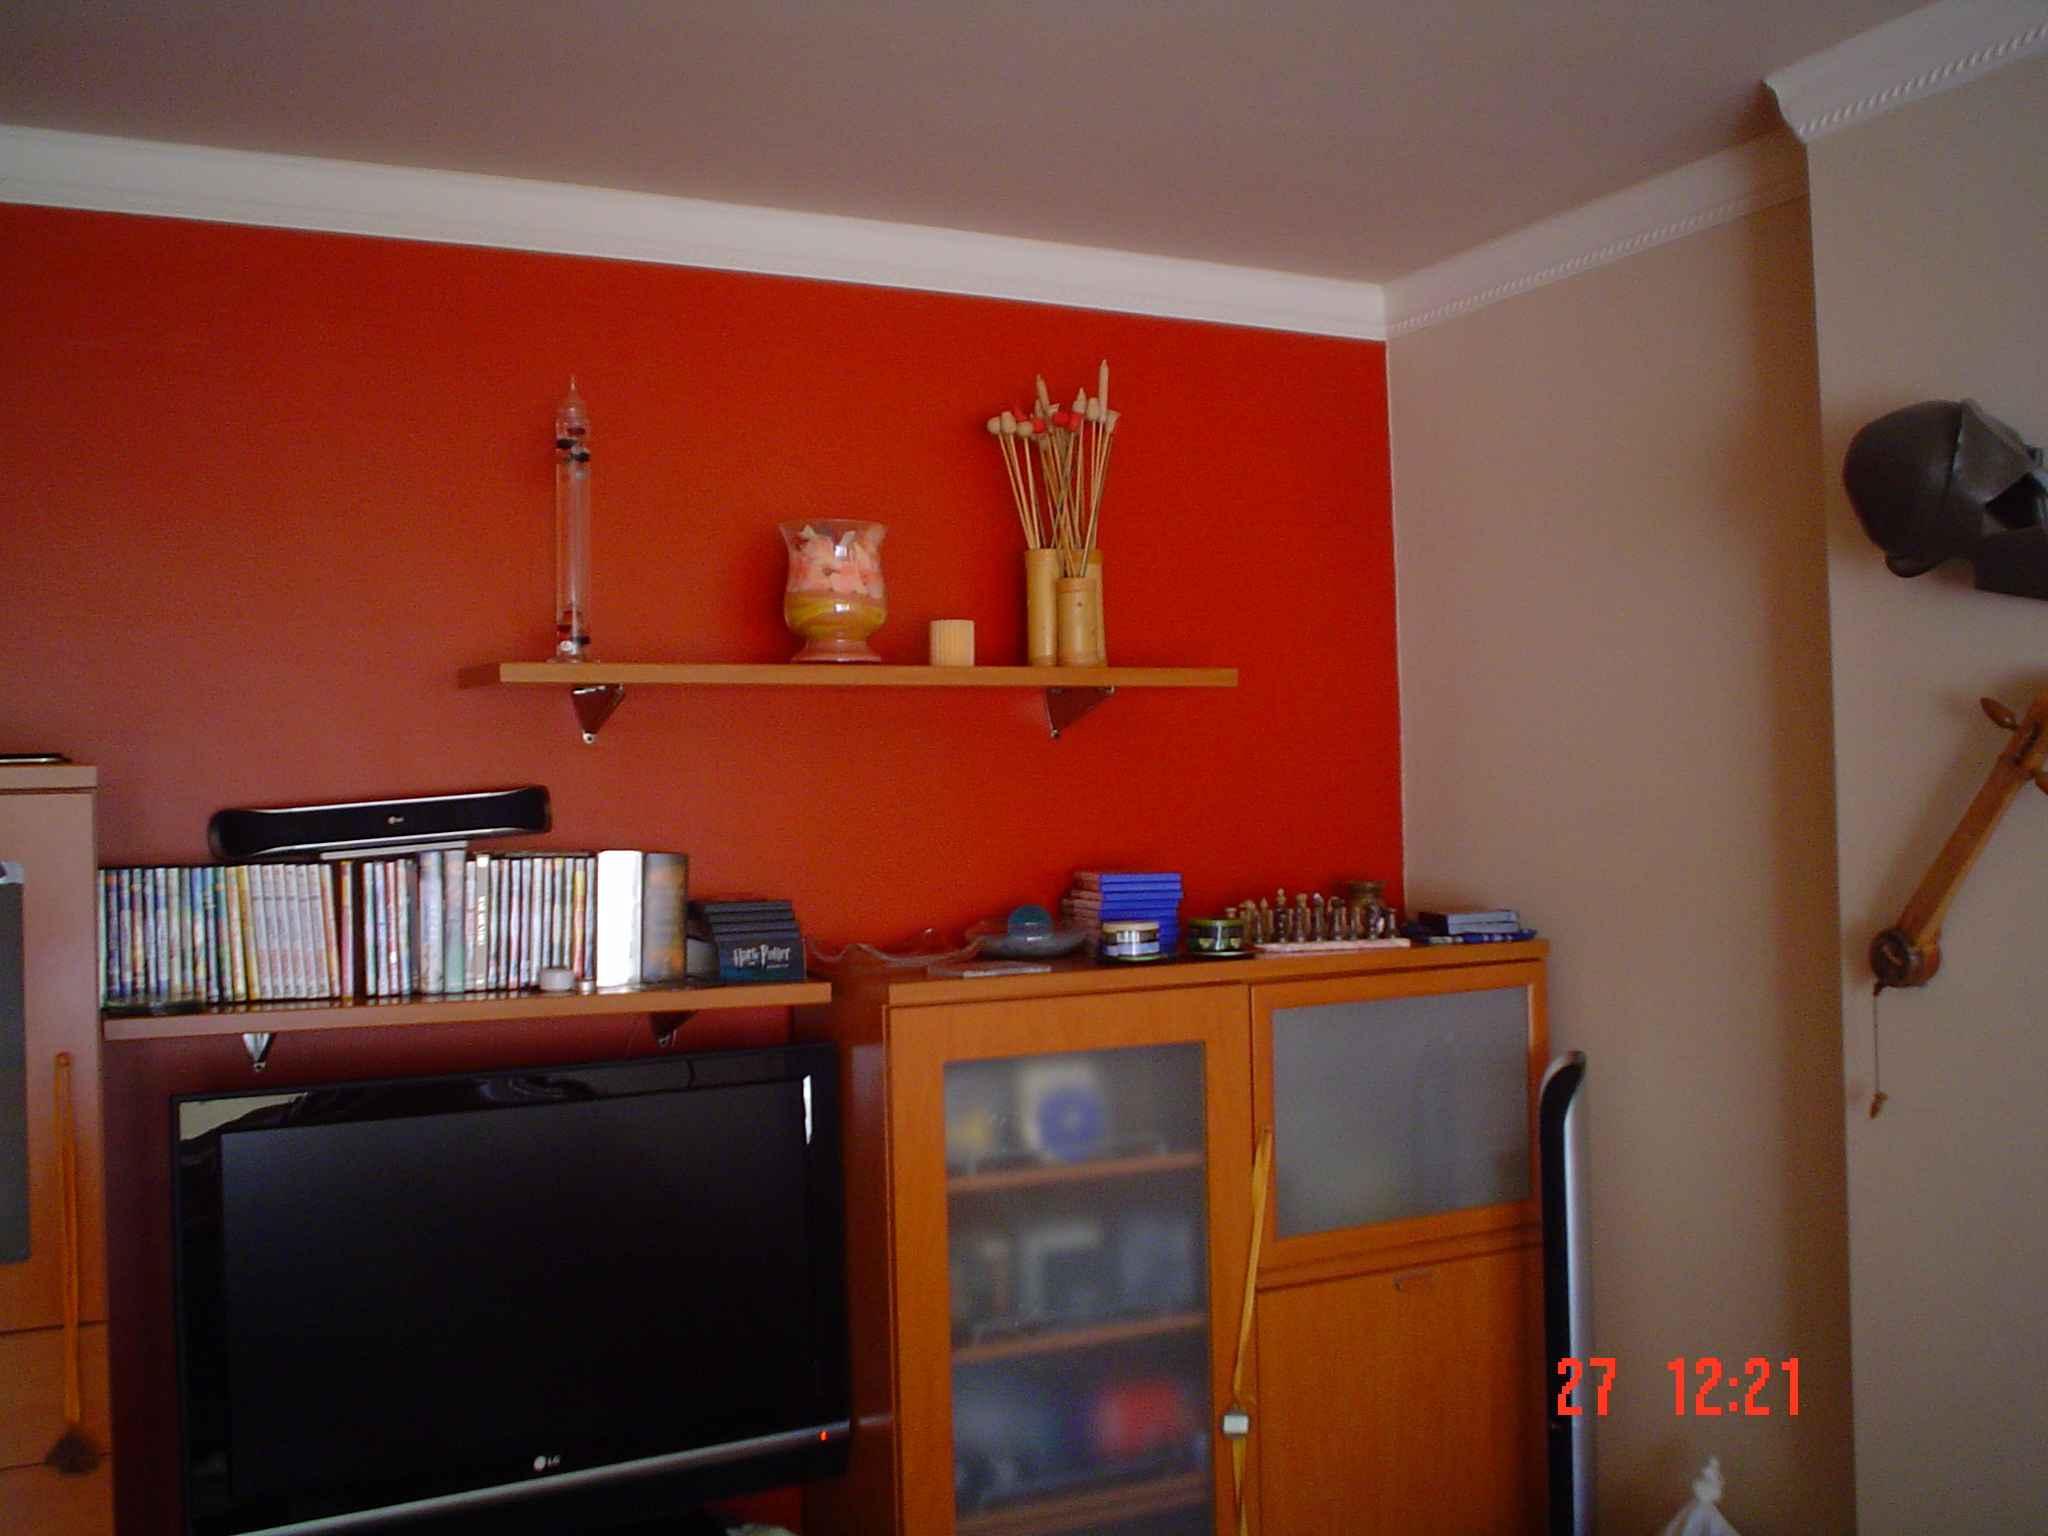 Pintor en terrassa josep m ros pintura decorativa e - Pinturas para cocinas y banos ...